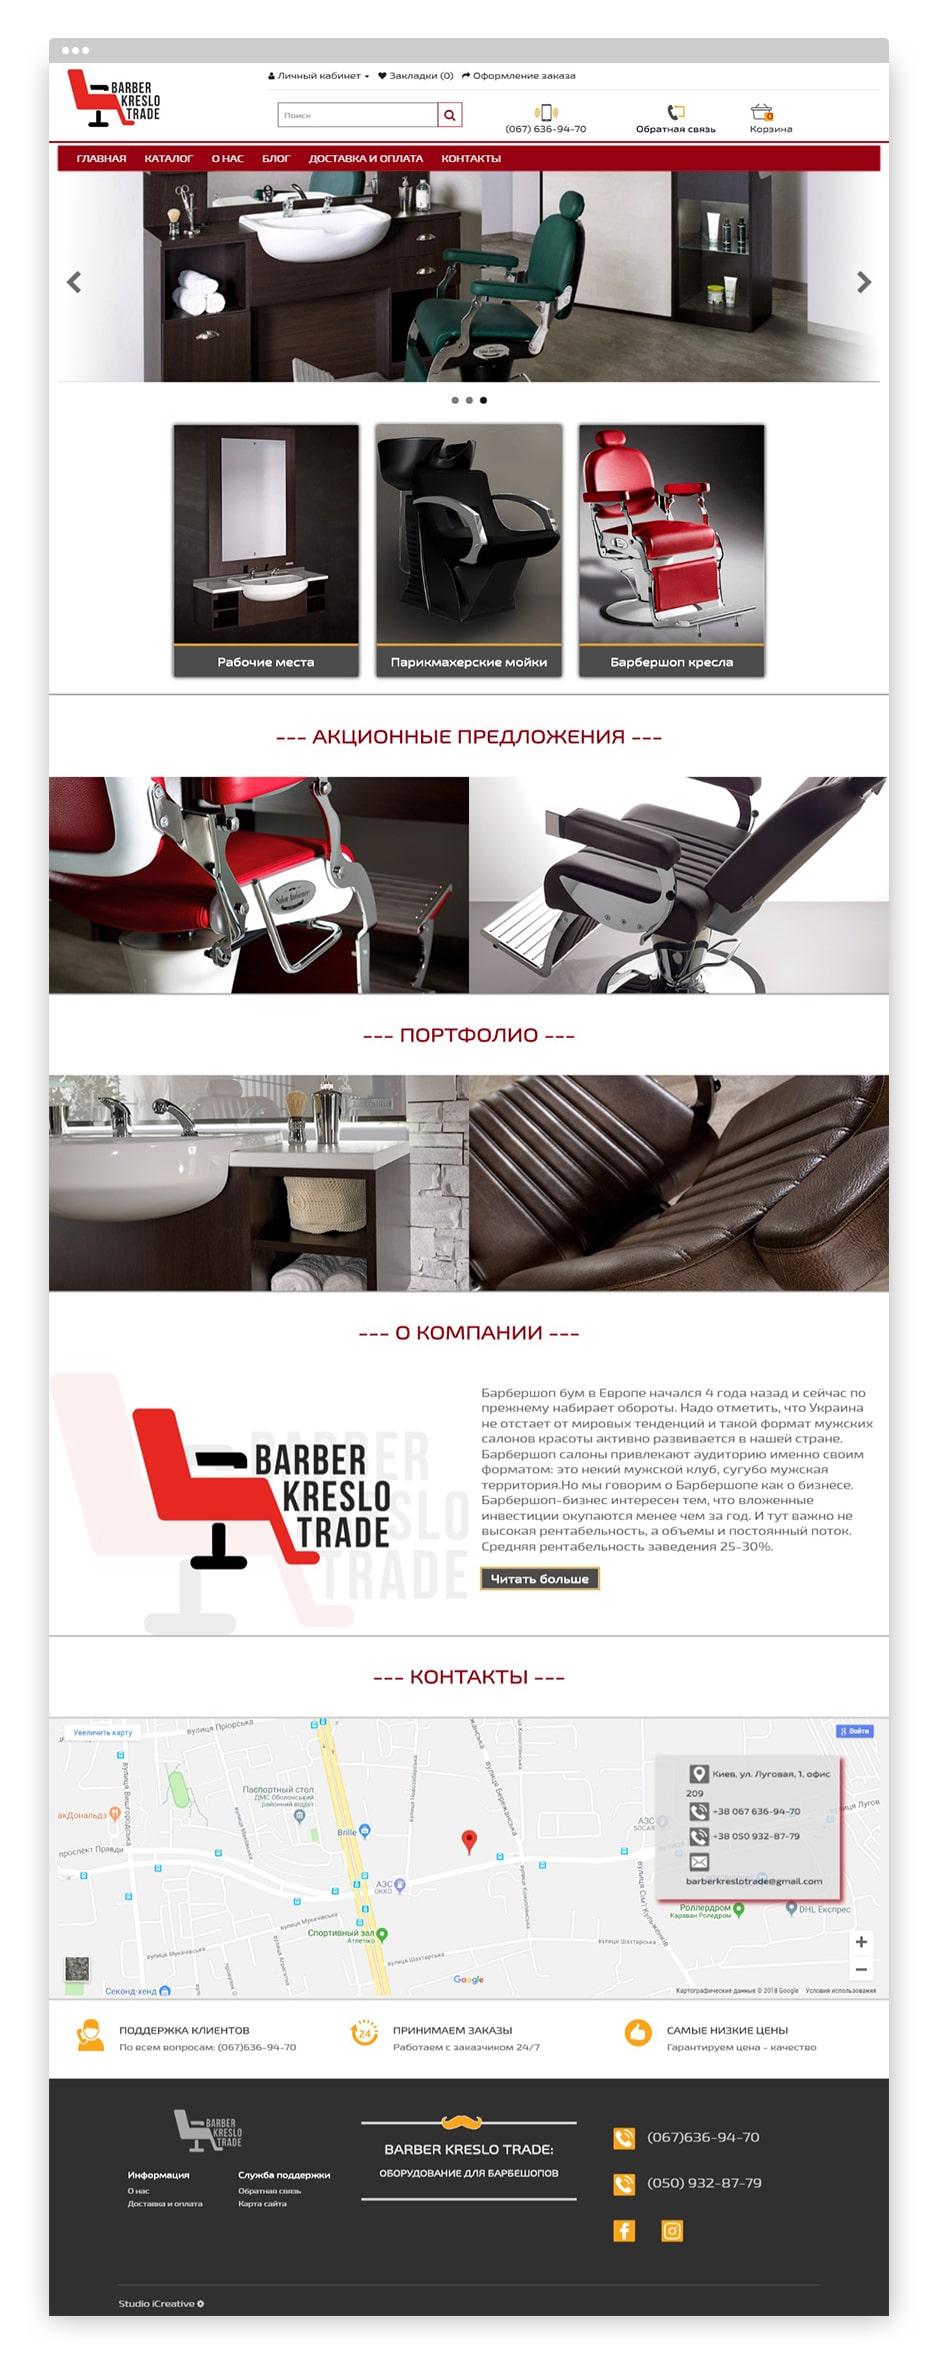 icreative.com.ua_barber kreslo trade